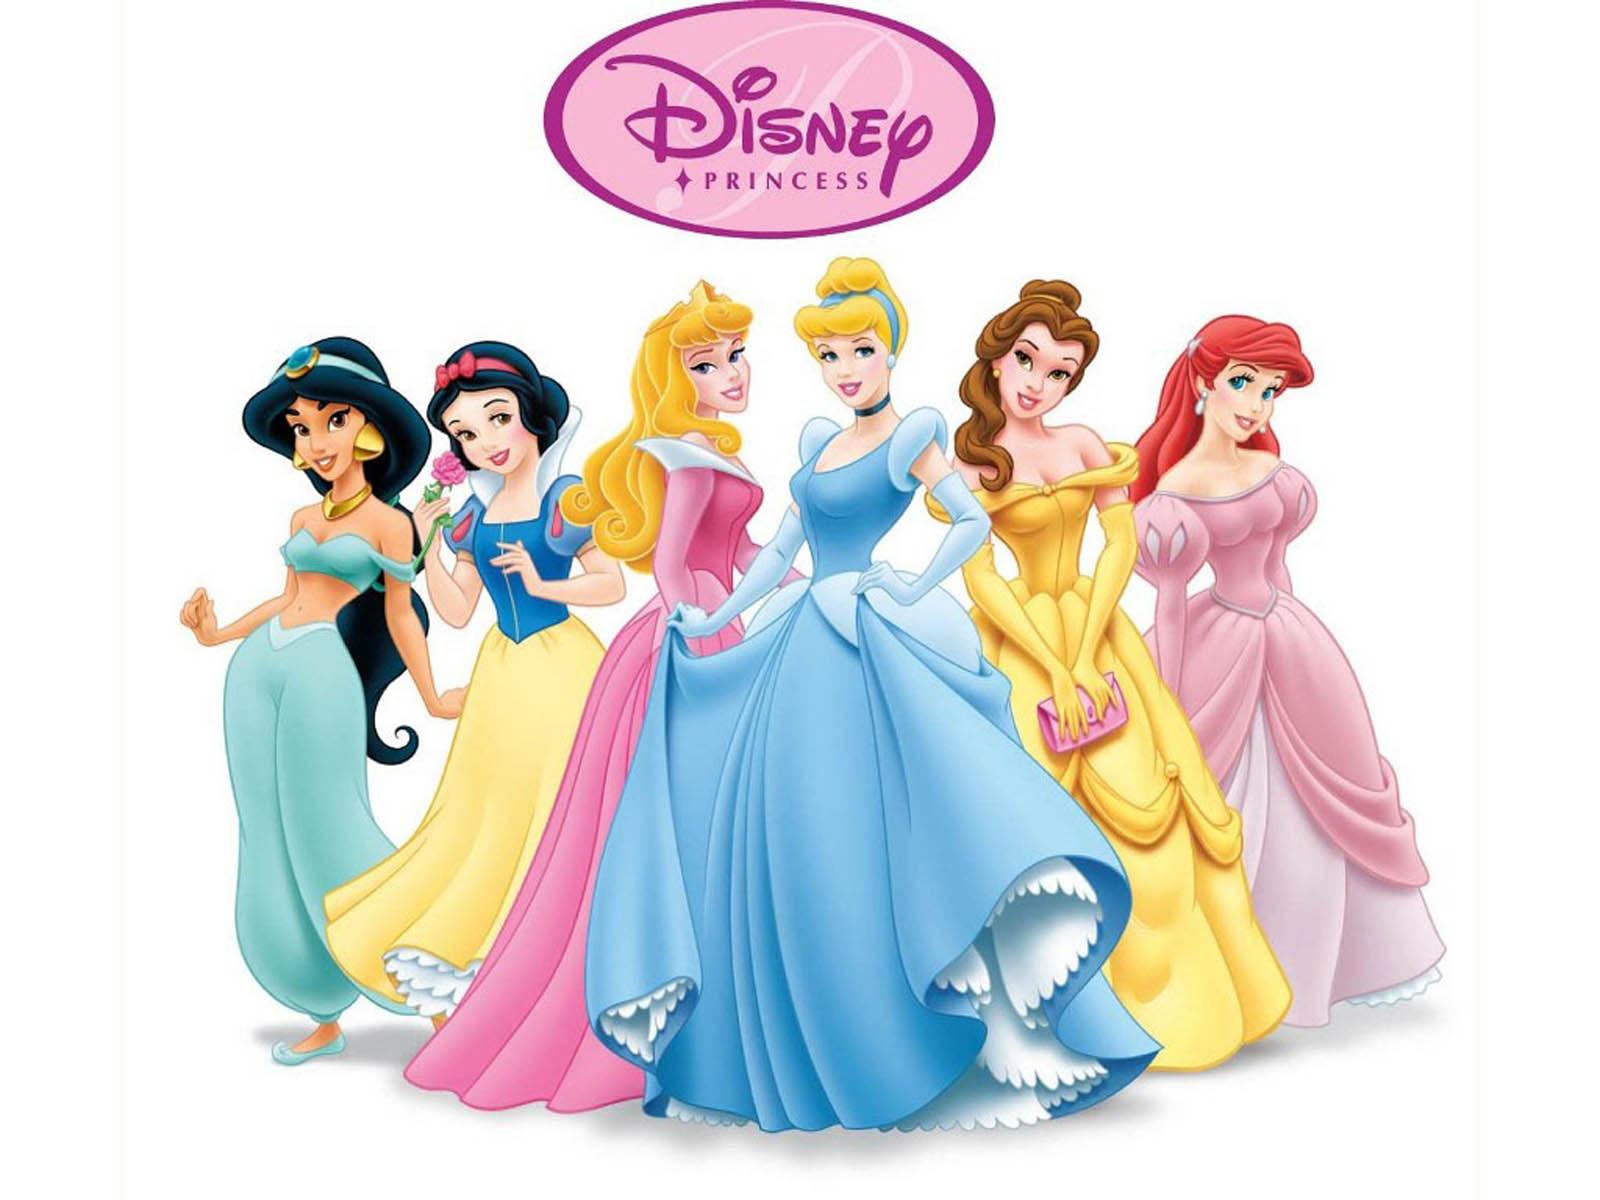 Disney Princess Wallpapers:Image to Wallpaper